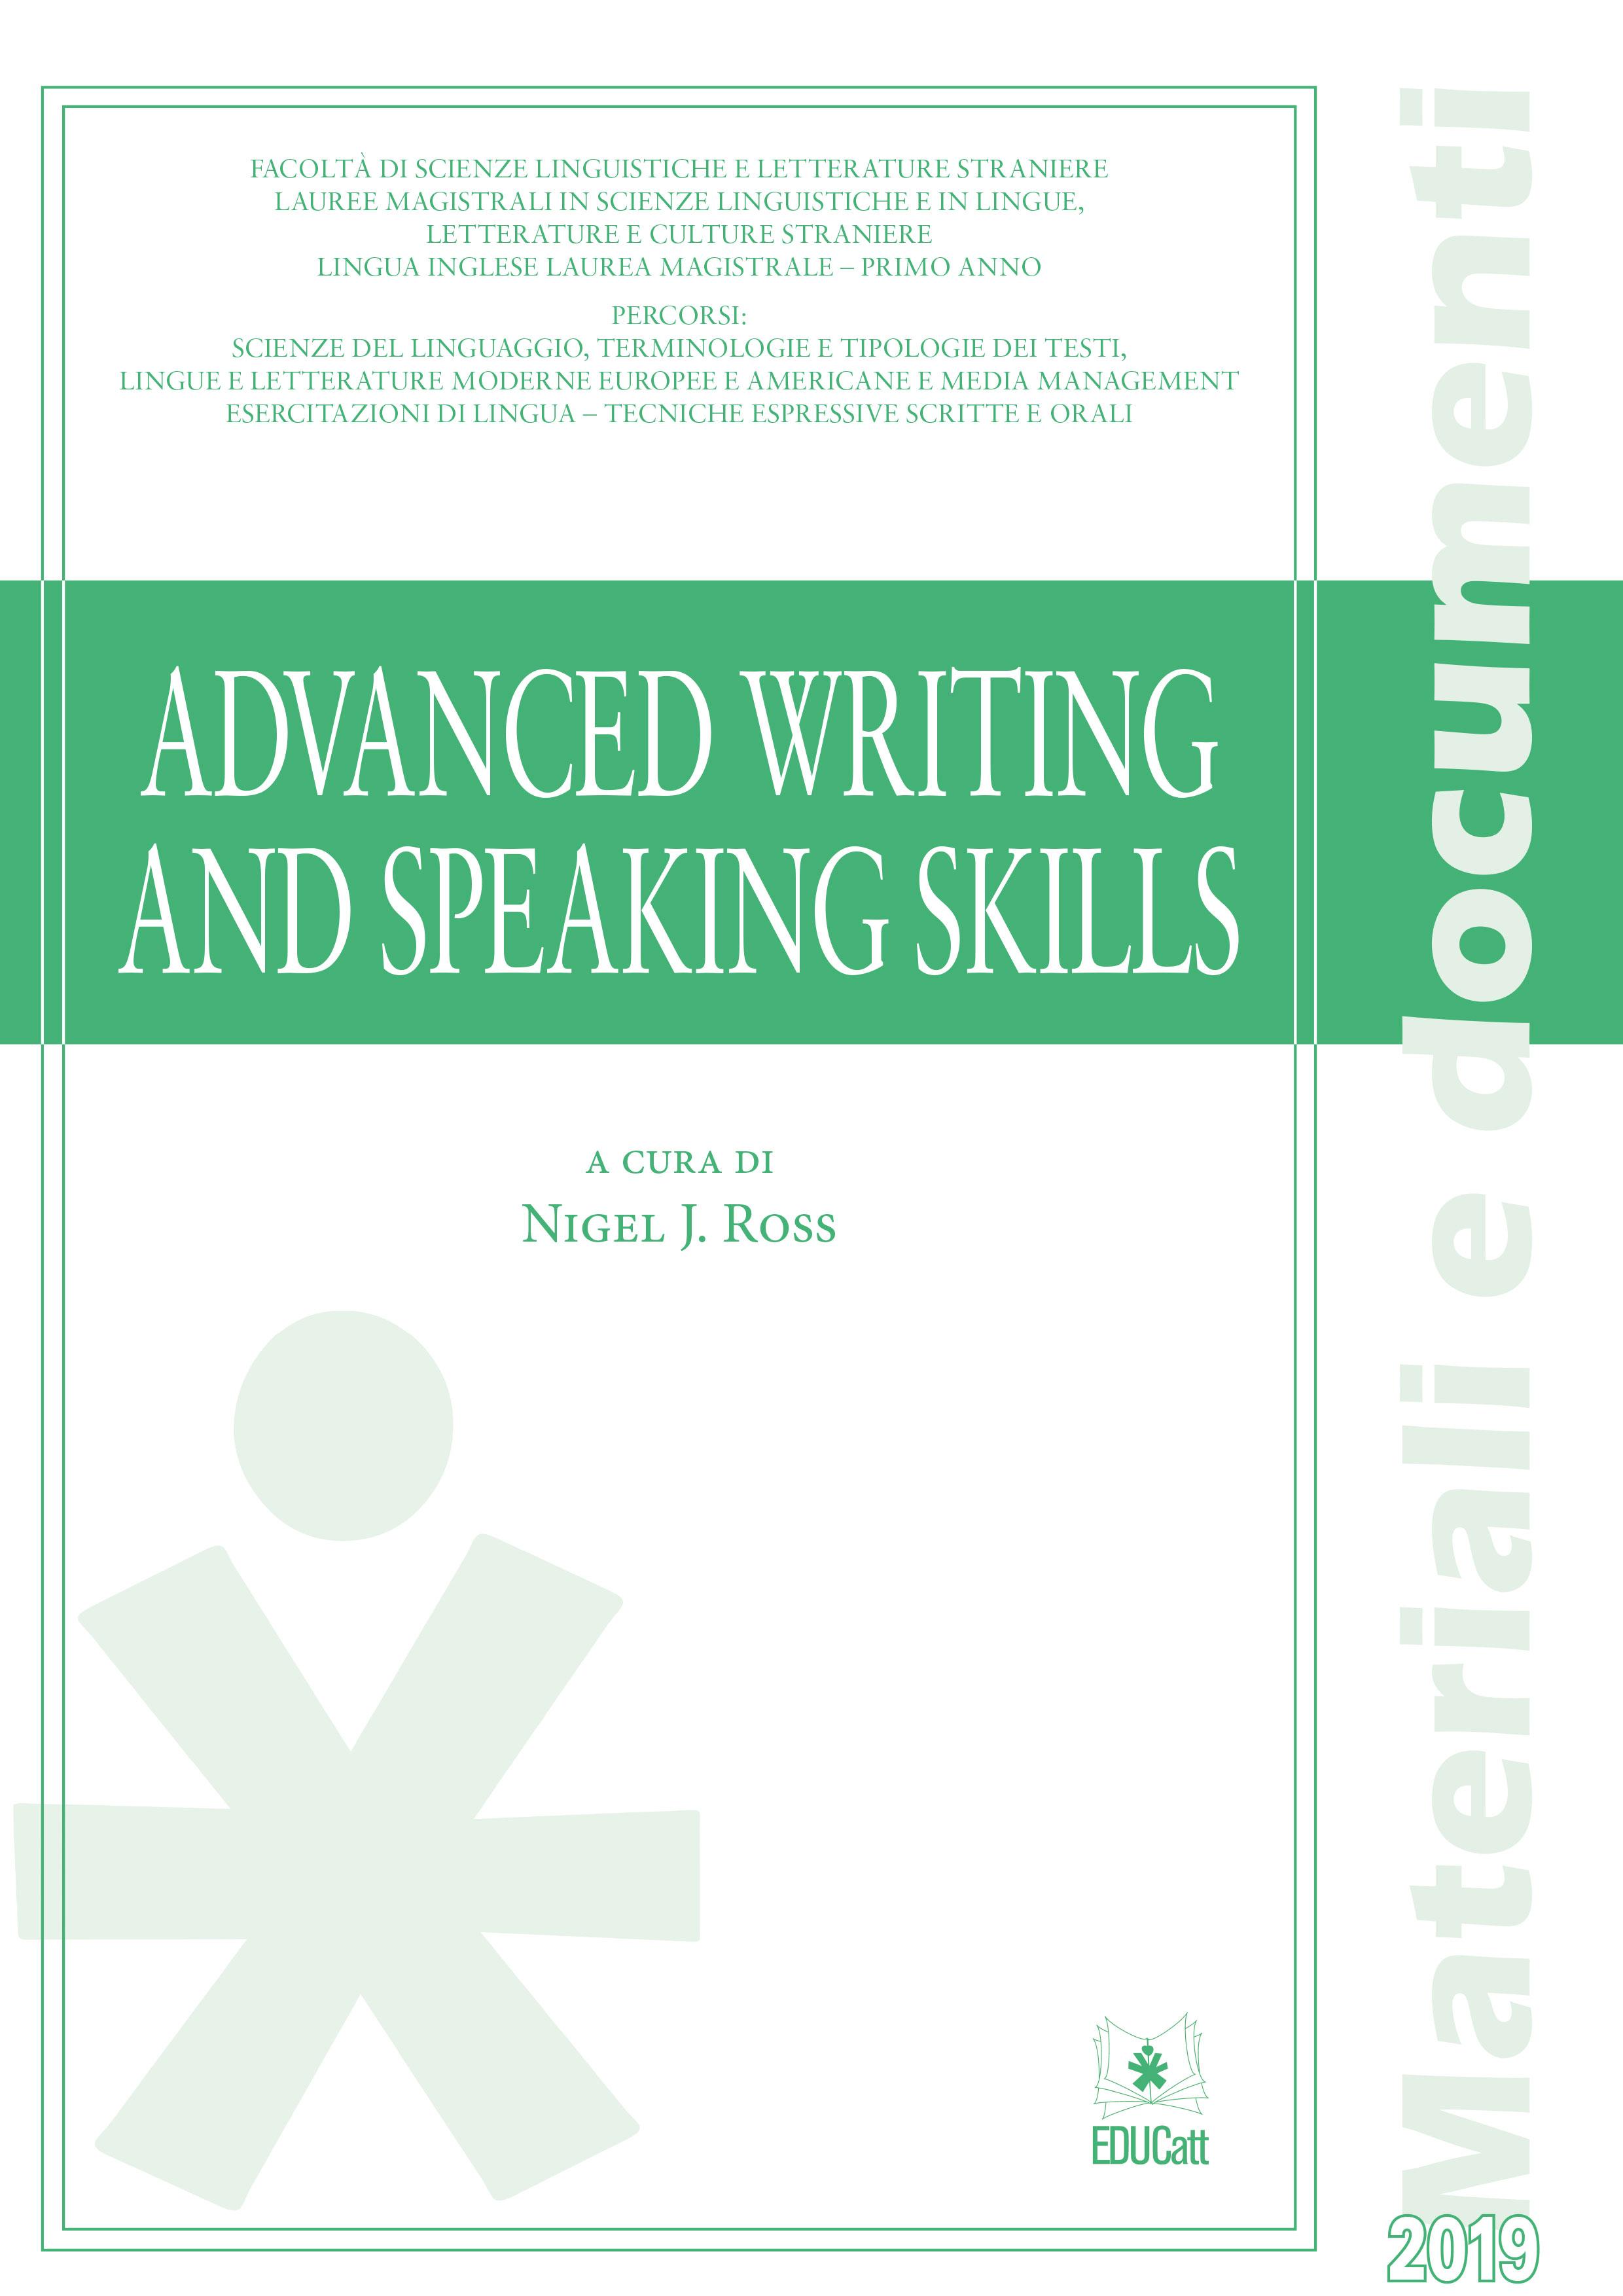 Advanced writing and speaking skills